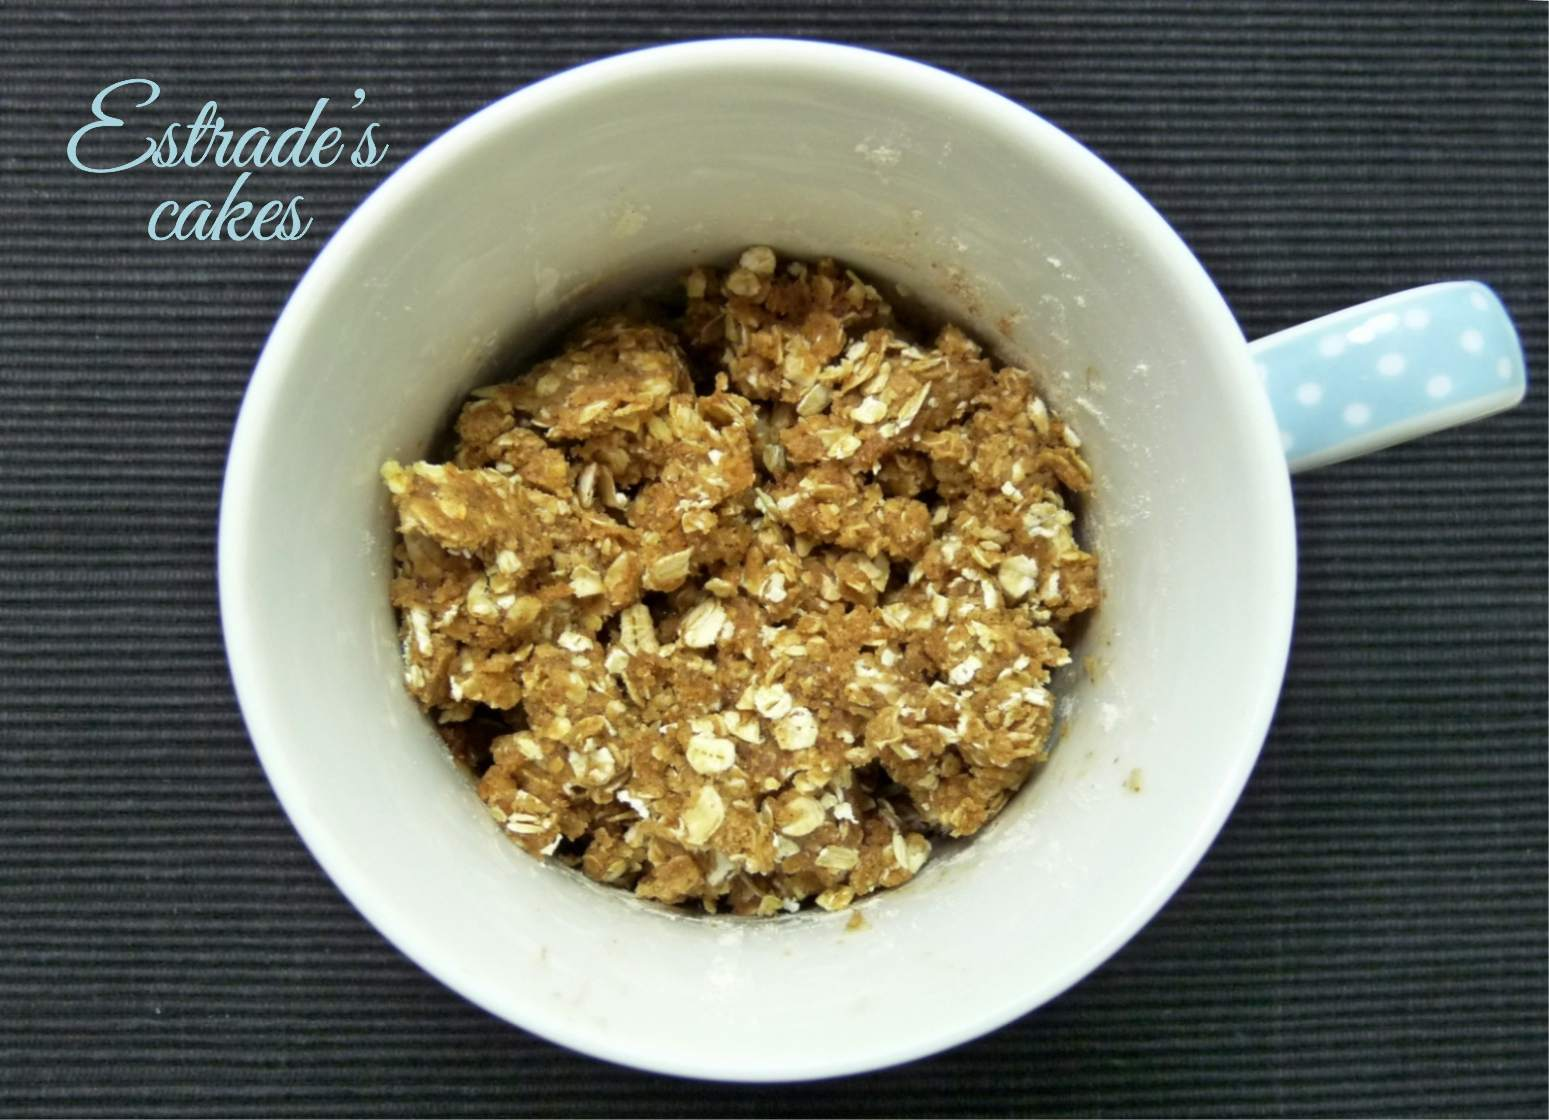 receta de crumble de peras al microondas - 3